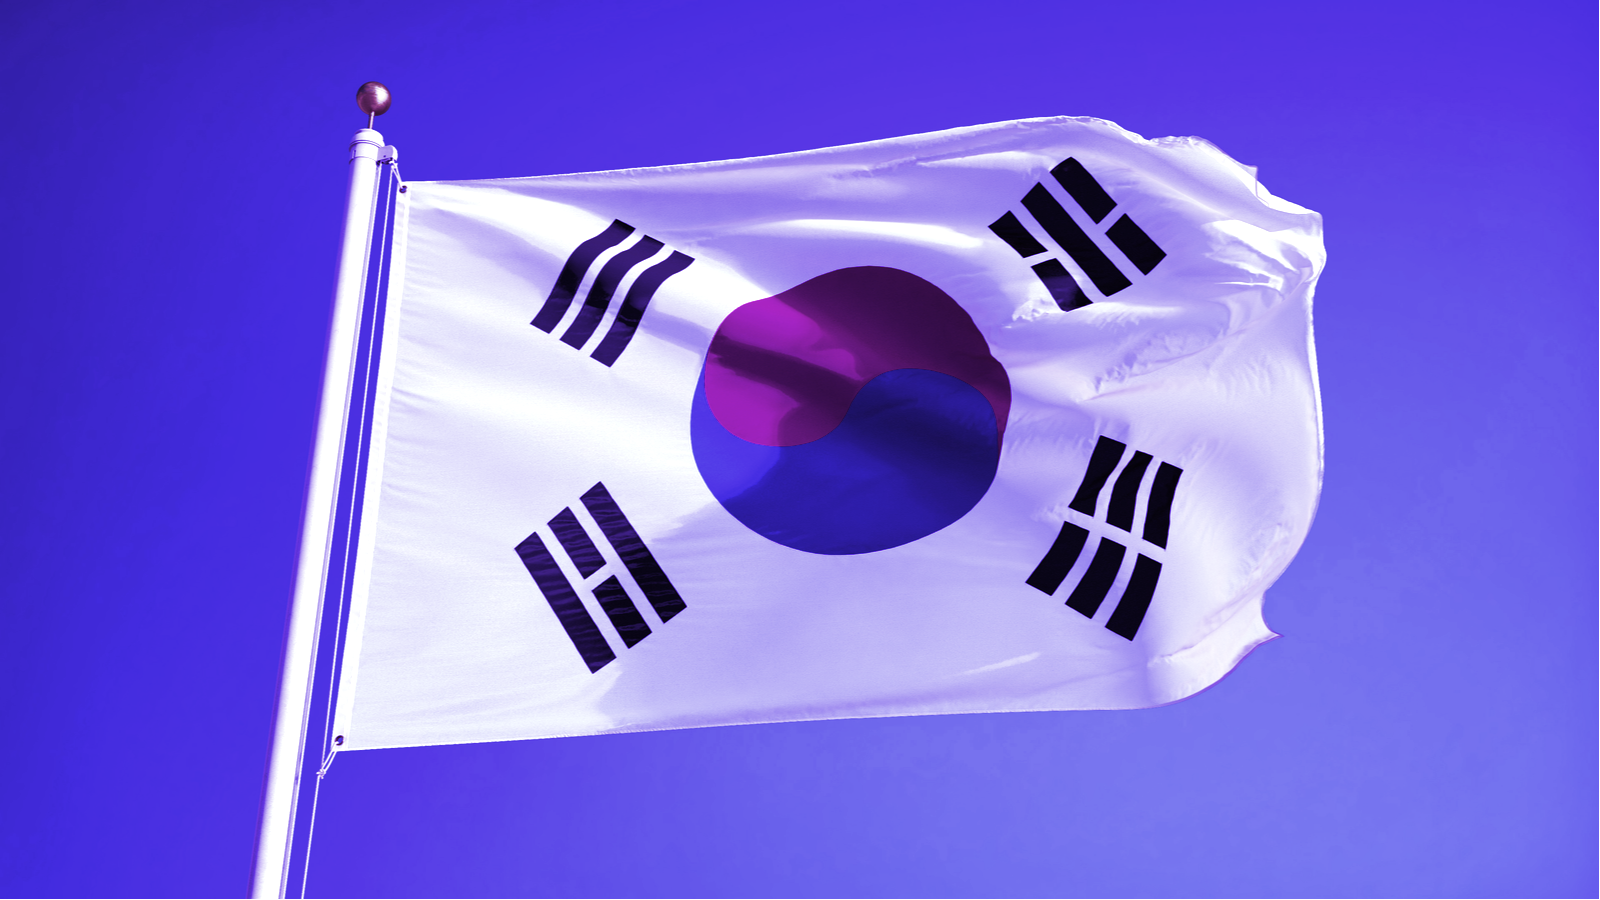 Bank of Korea to Pilot CBDC on Samsung Galaxy Phones